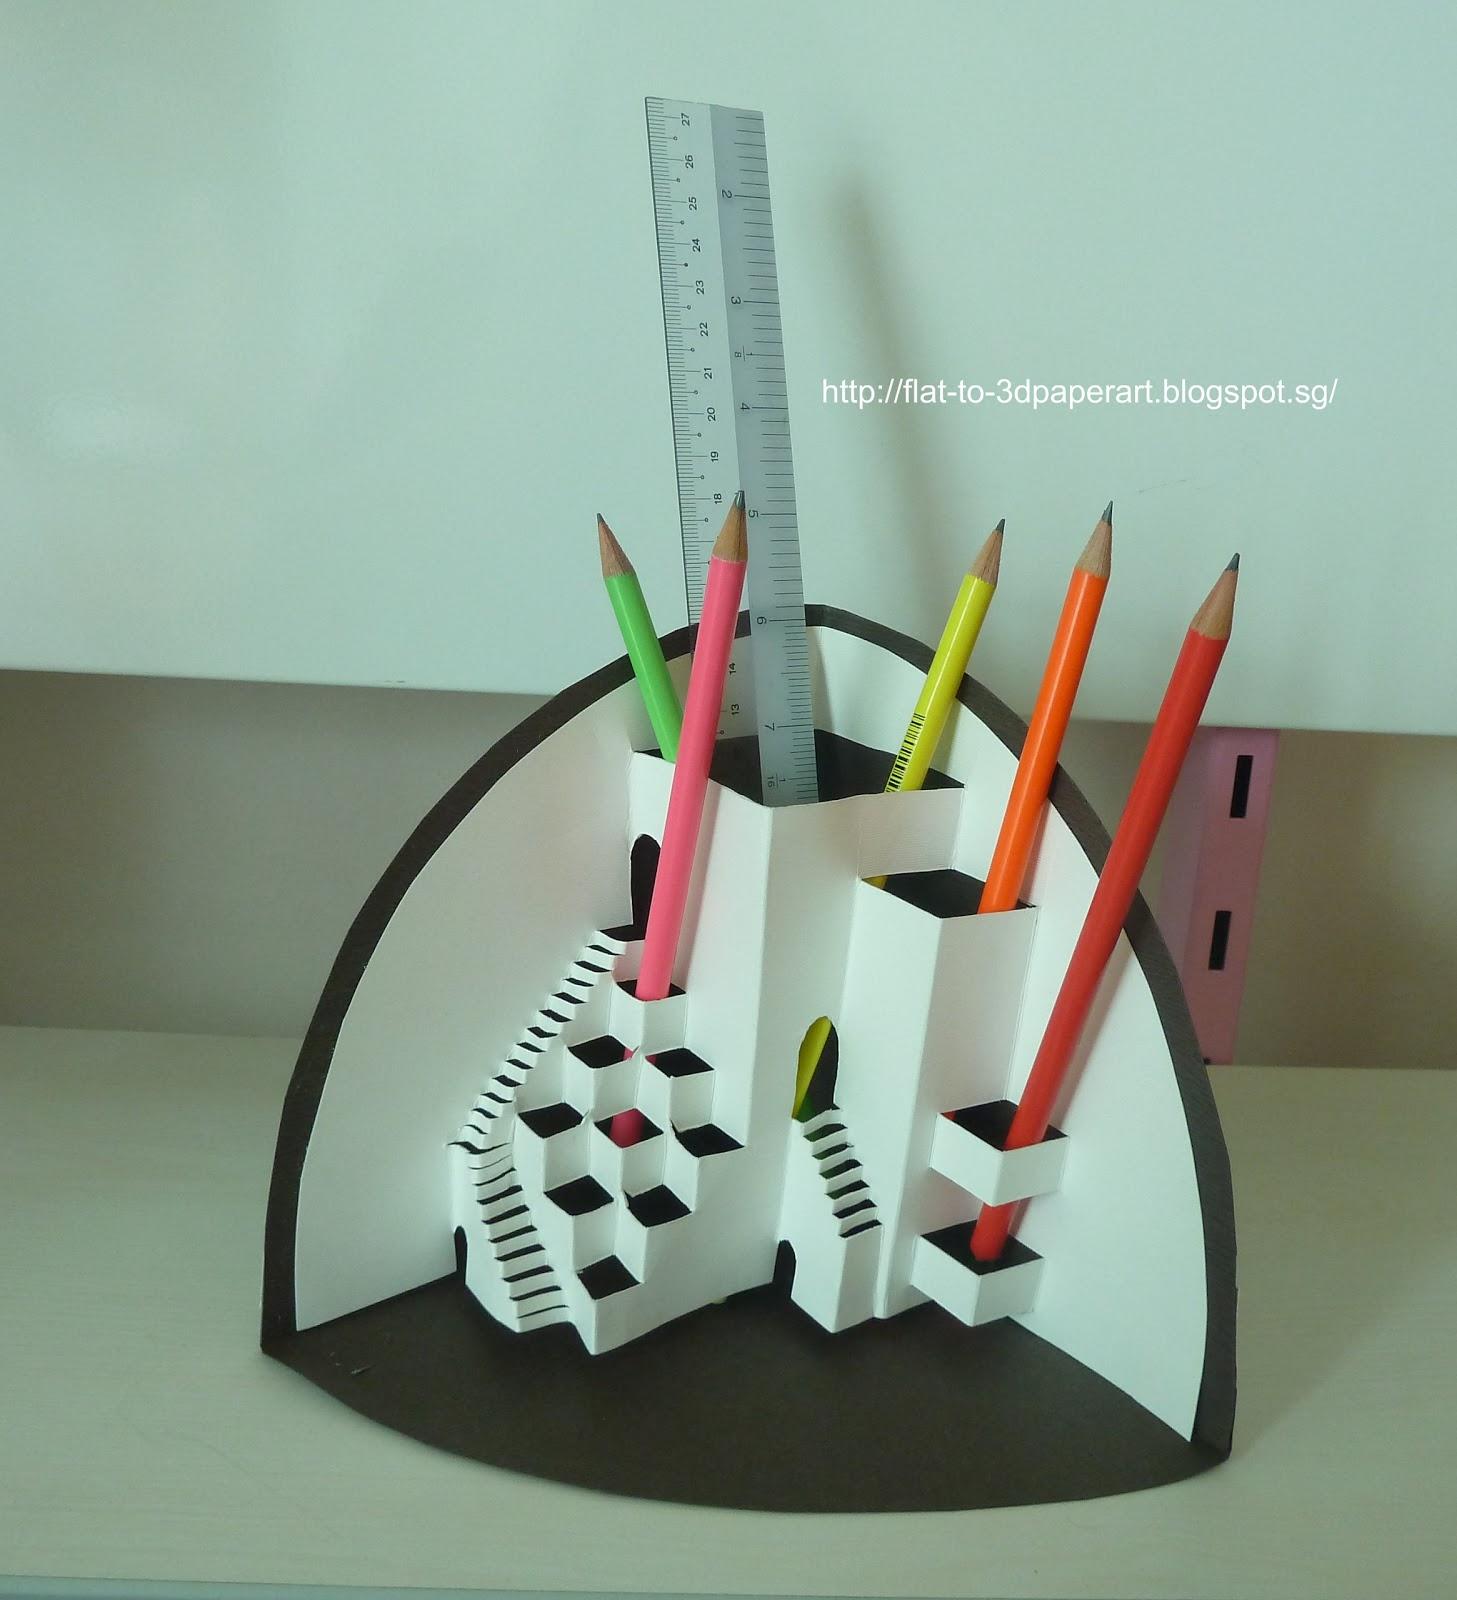 Origami kirigami paper artist and designer in singapore for Kirigami paper art